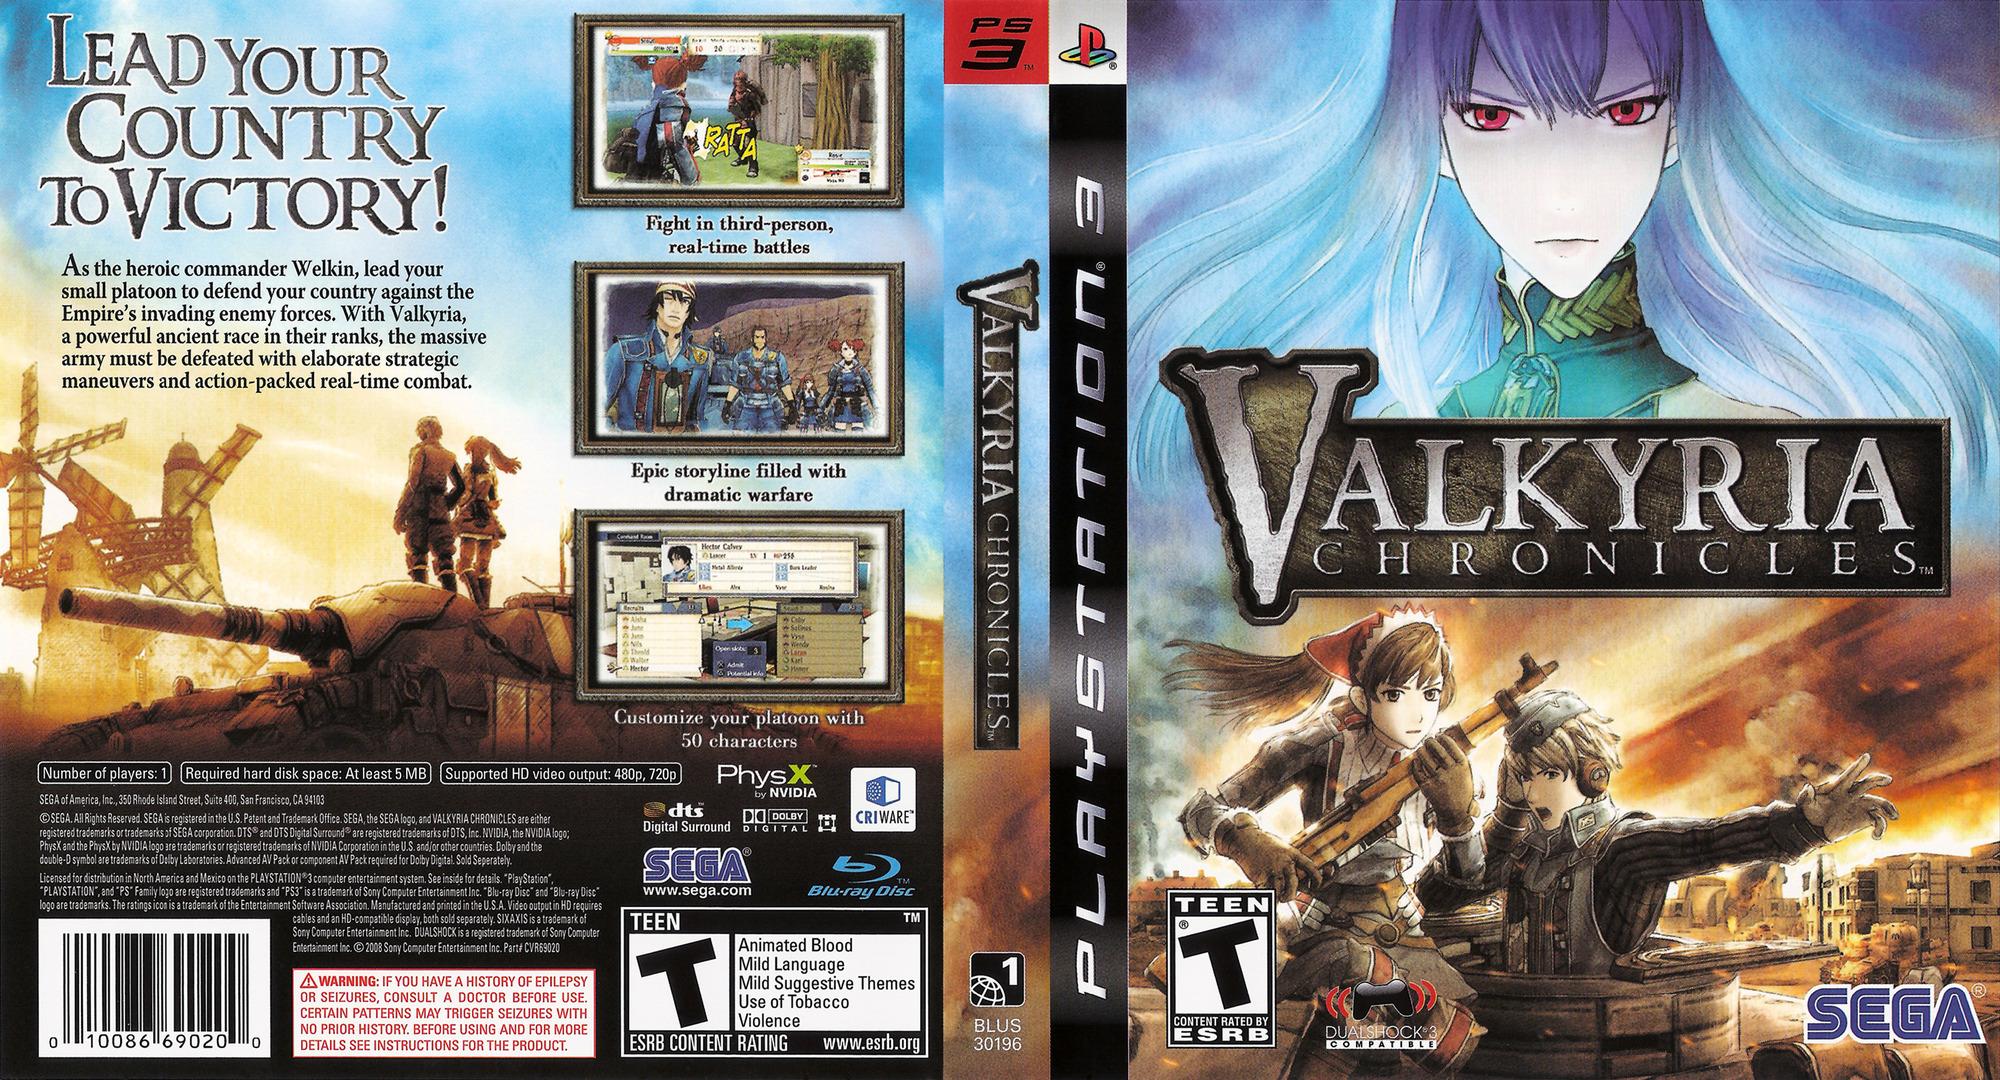 PS3 - Valkyria Chronicles [US][ALL-DLC][PKG][MEGA]